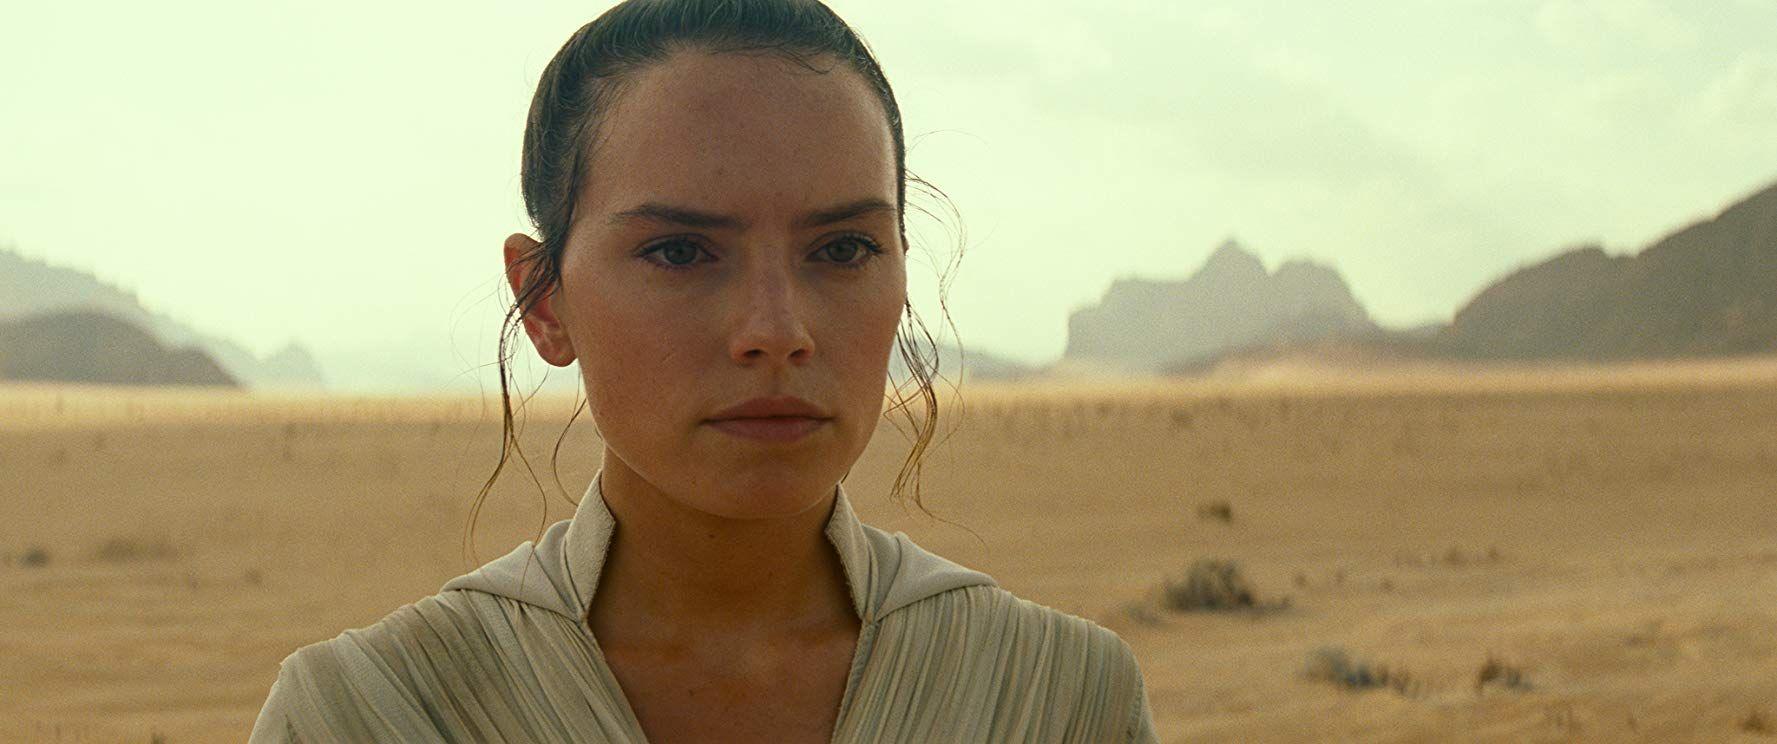 Imagen 7 de Star Wars: El Ascenso de Skywalker